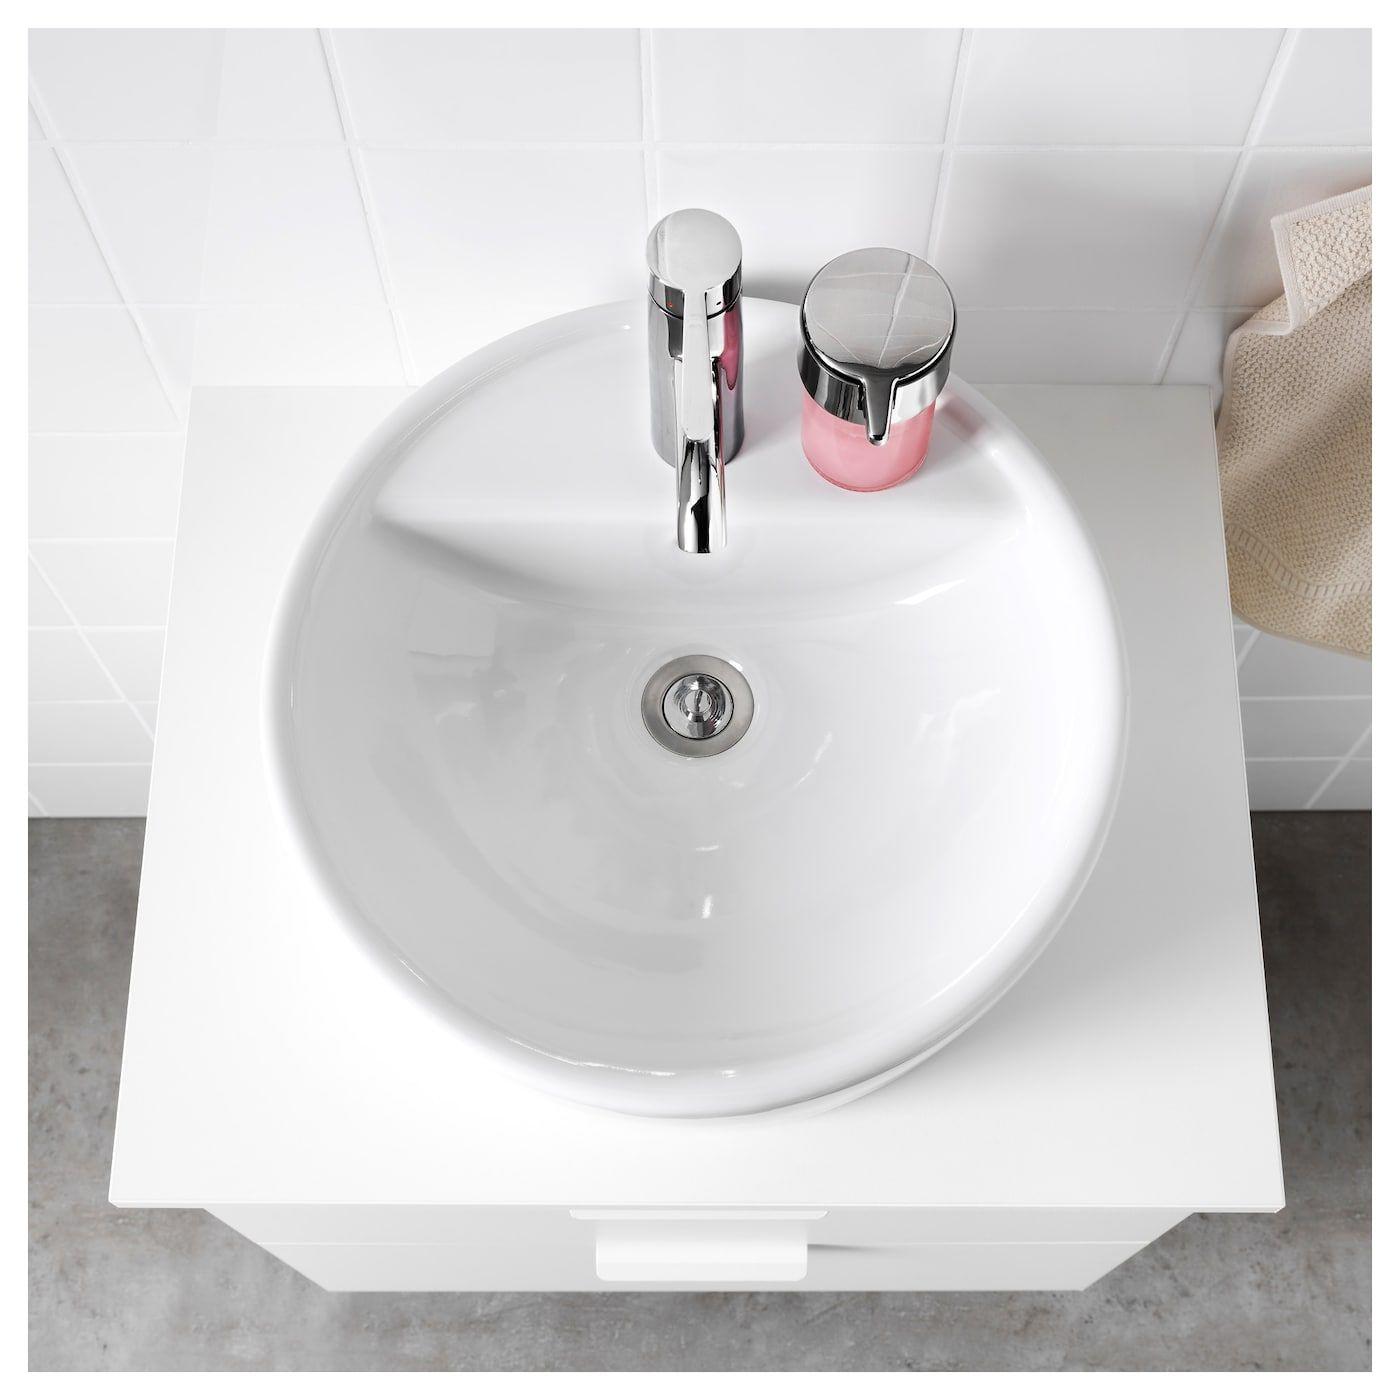 Tornviken Countertop Sink White 17 3 4 Lavabo A Poser Vasque Ikea Ikea